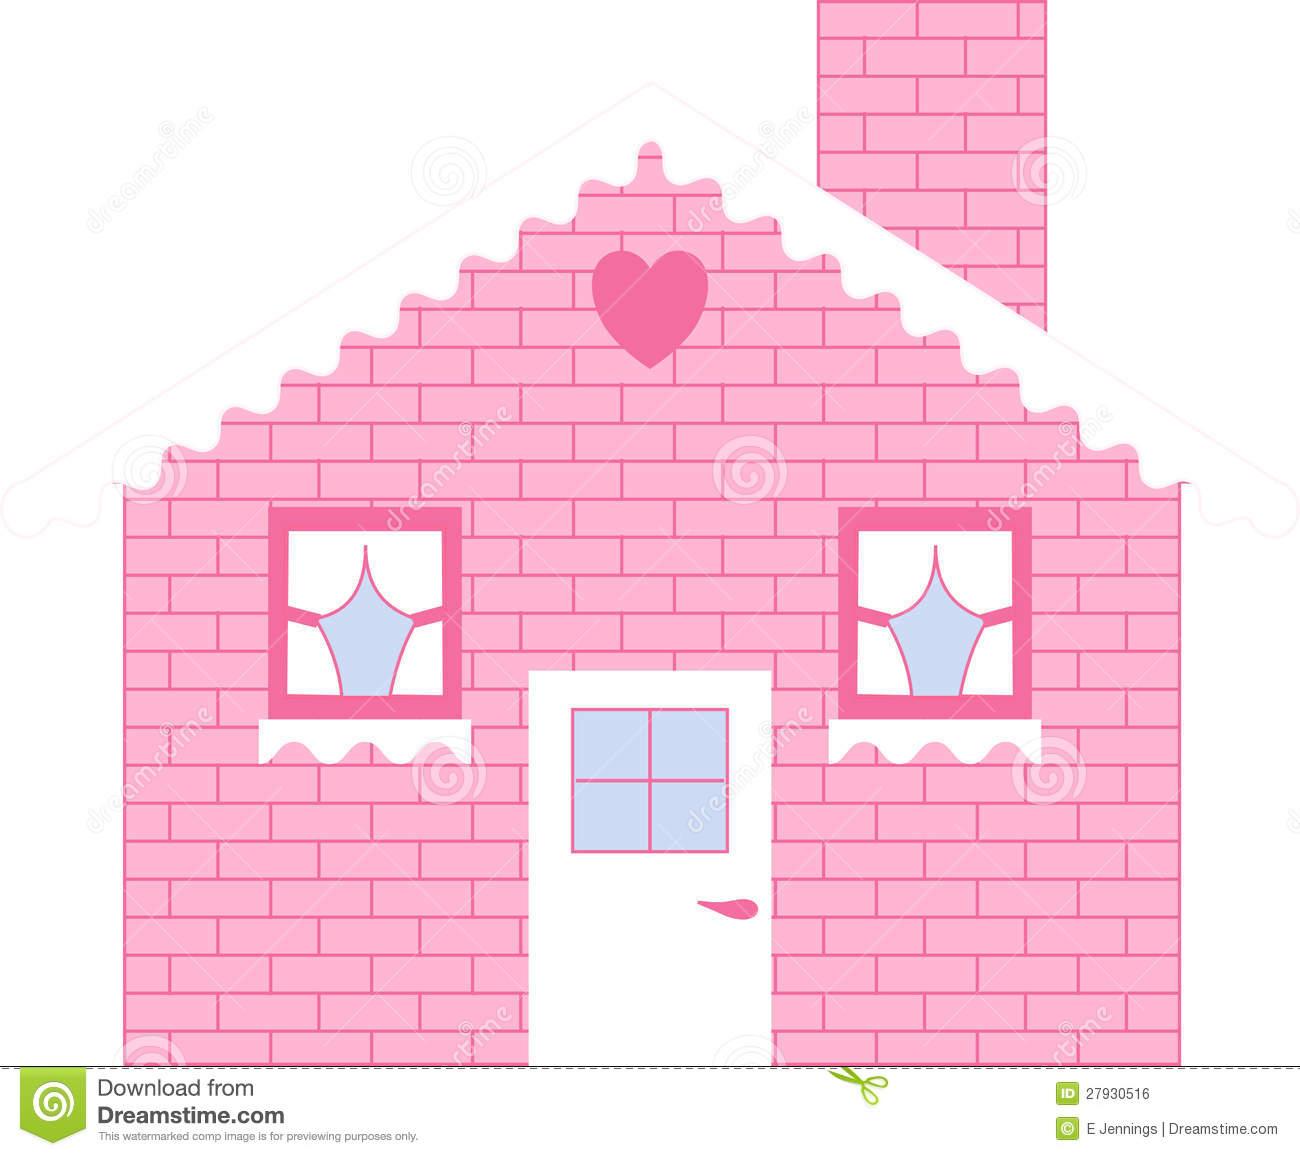 Dolls house brick clipart.